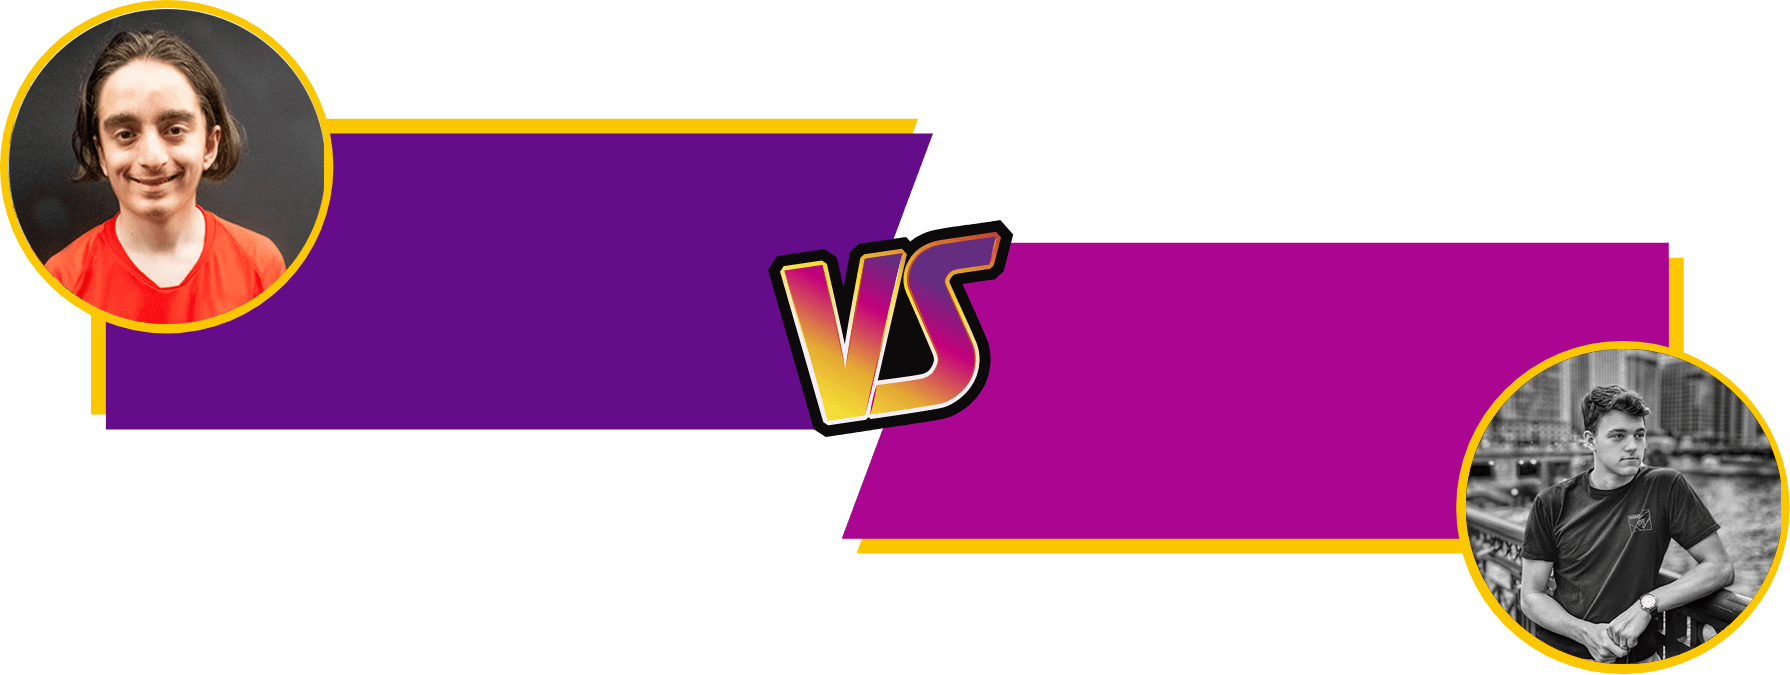 Zankye vs. Illinuc